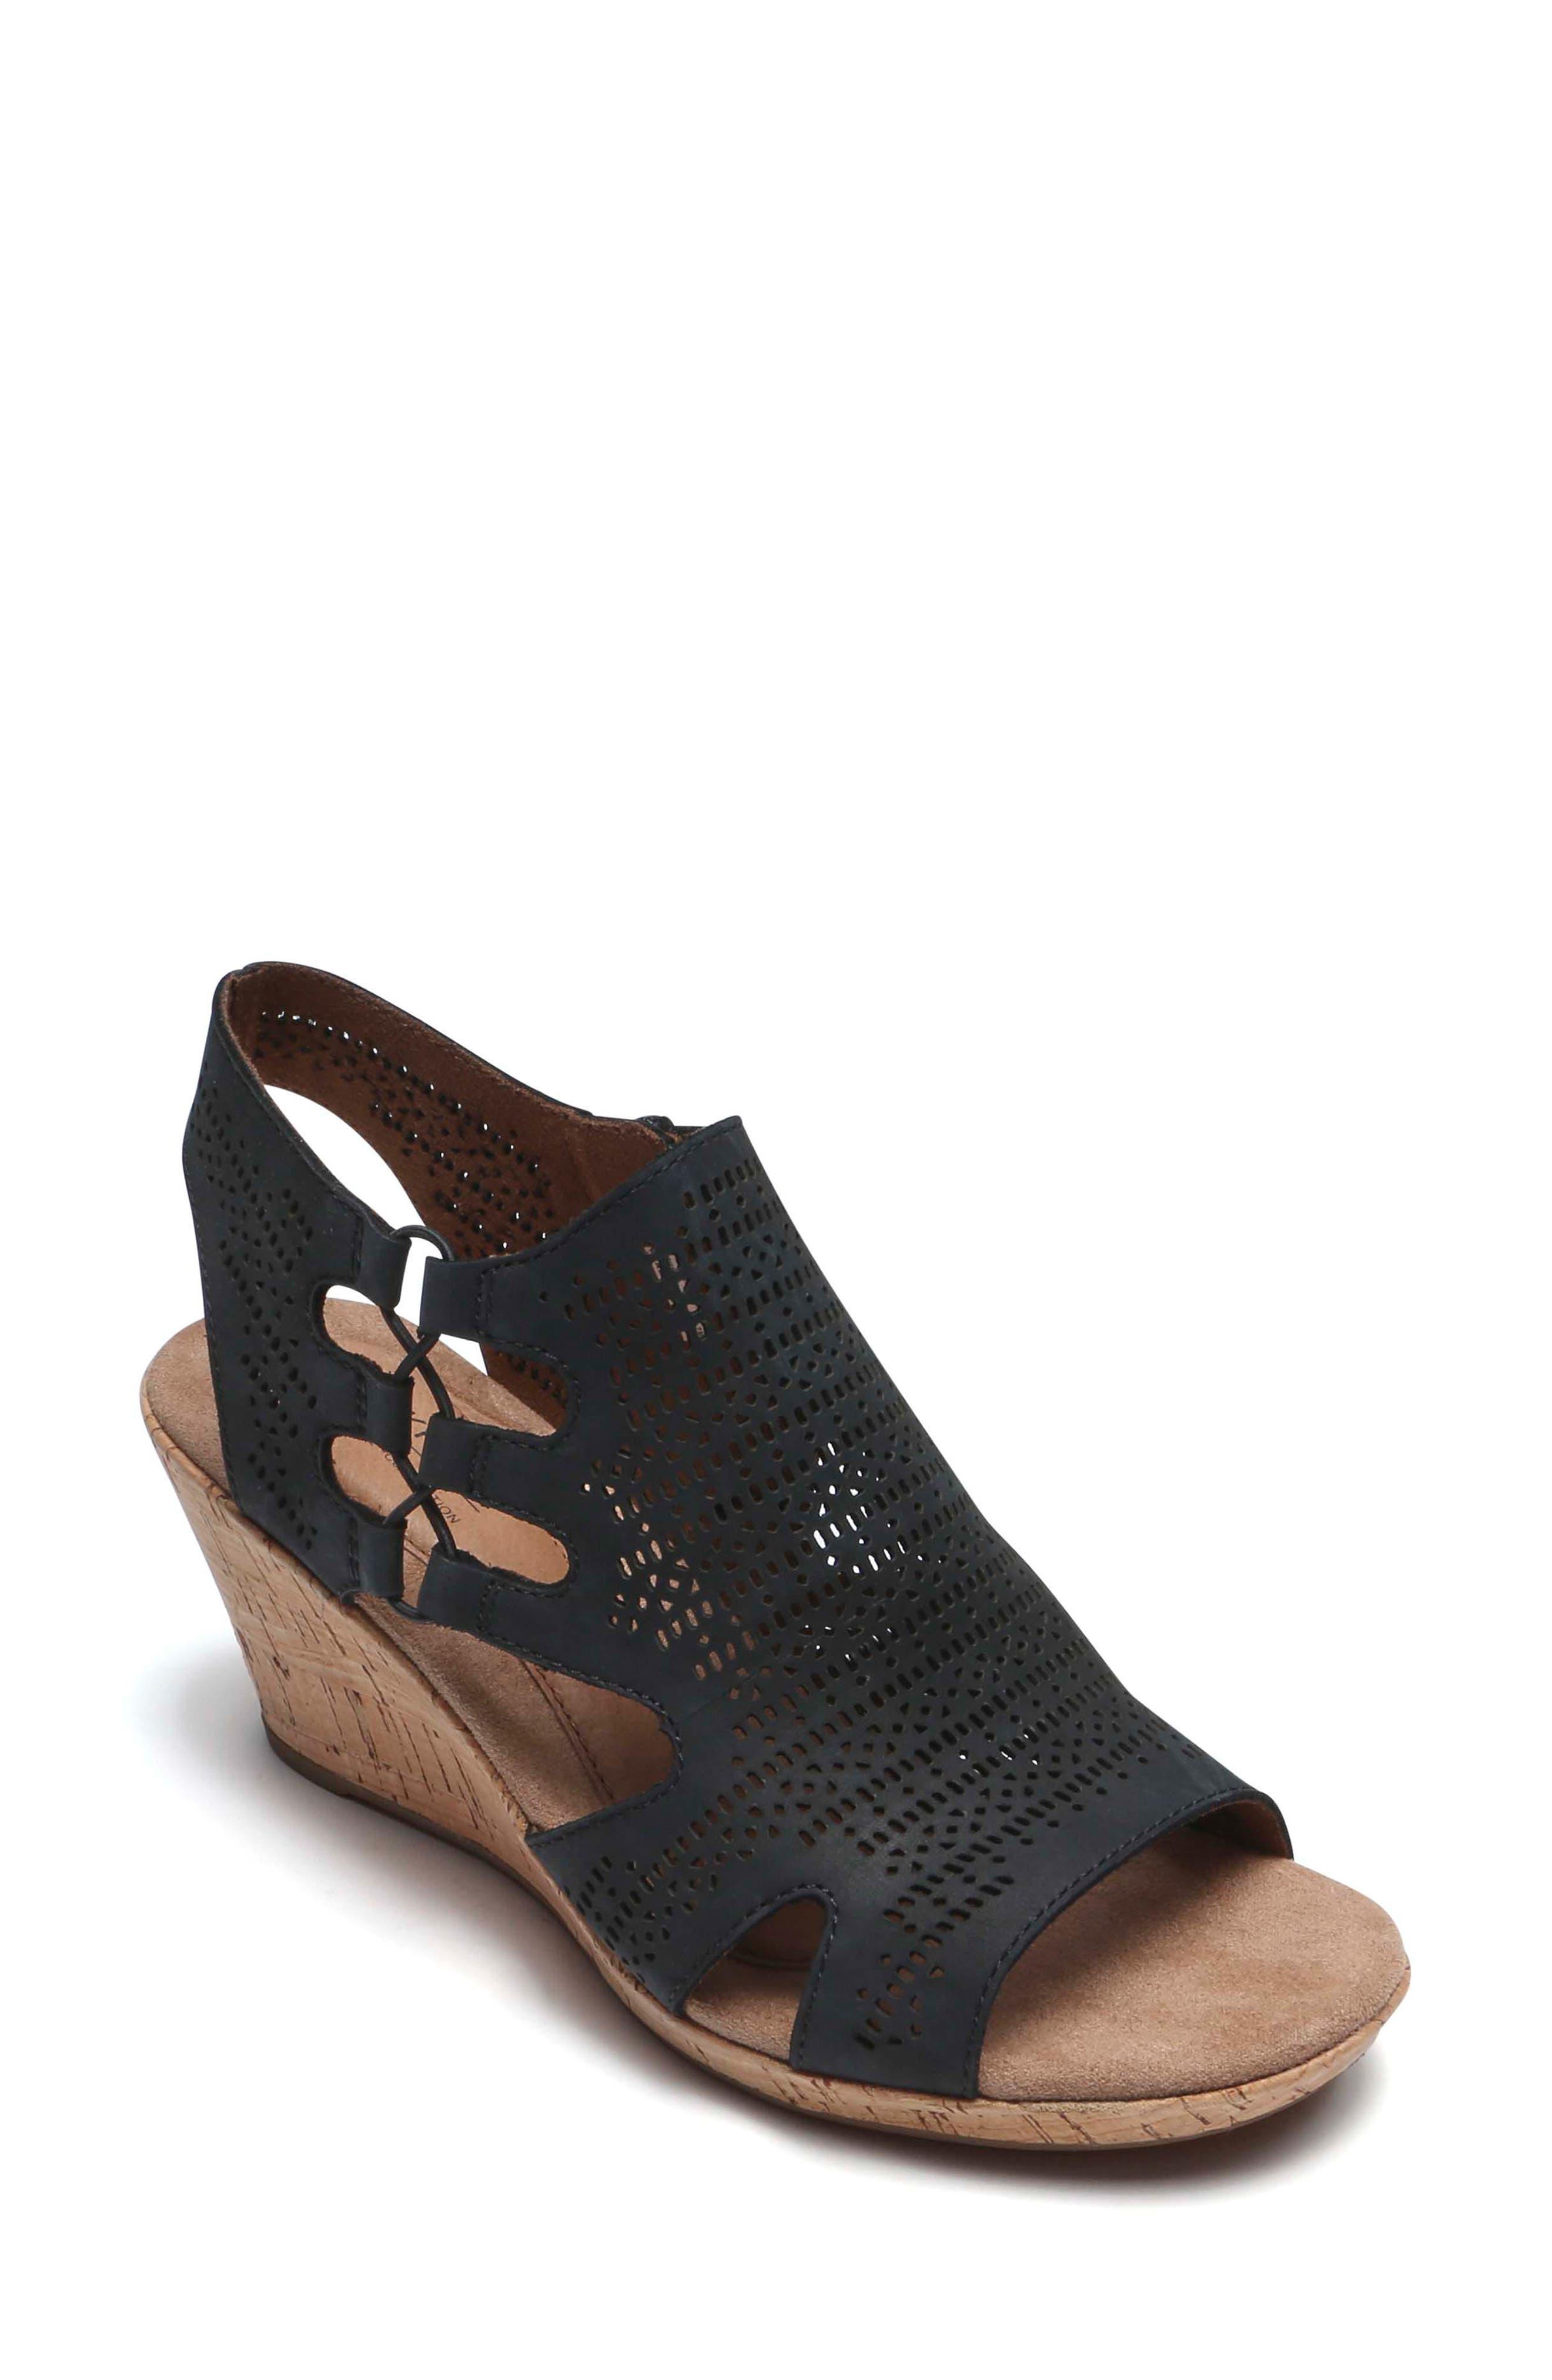 Janna Perforated Wedge Sandal,                         Main,                         color, BLACK NUBUCK LEATHER